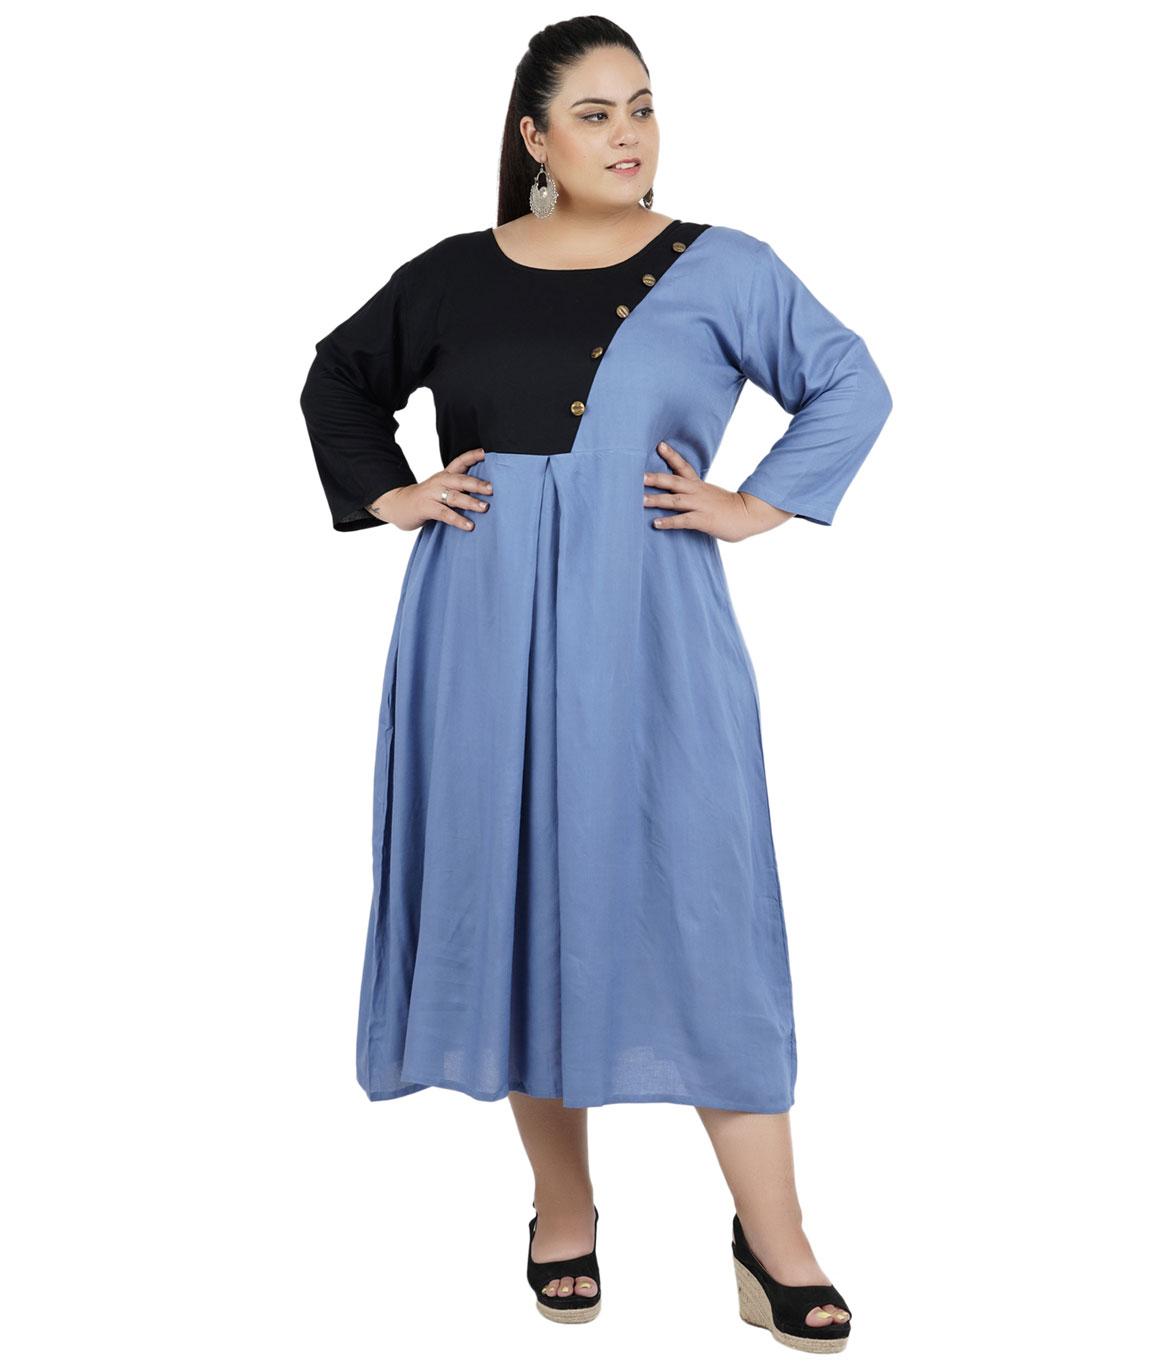 FAZZN Rayon Dresses For Women`s(Multi Color)